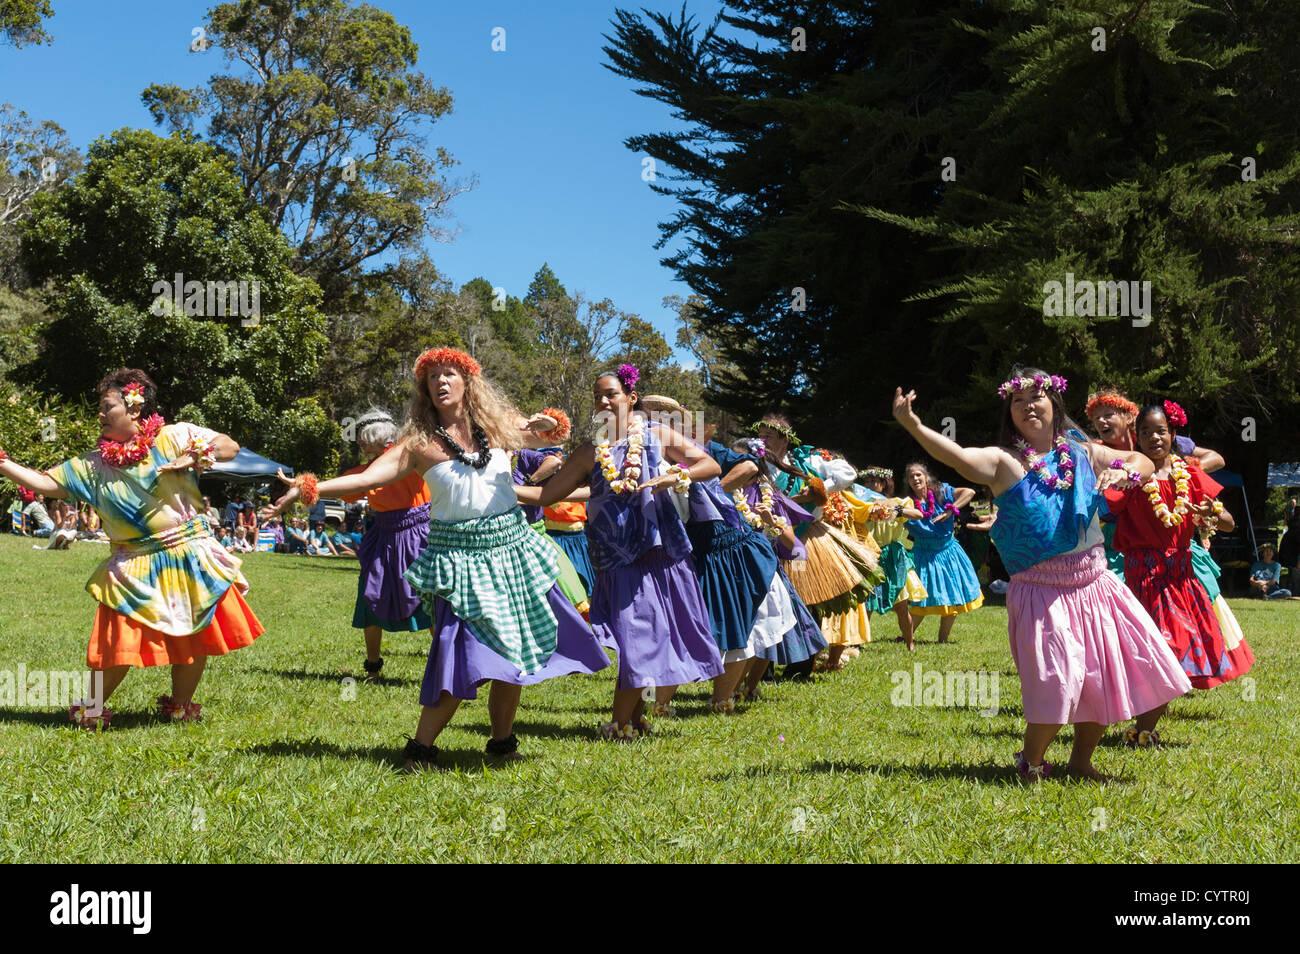 Elk284 7417 Hawaii Kauai Kokee State Park Hula Dancers